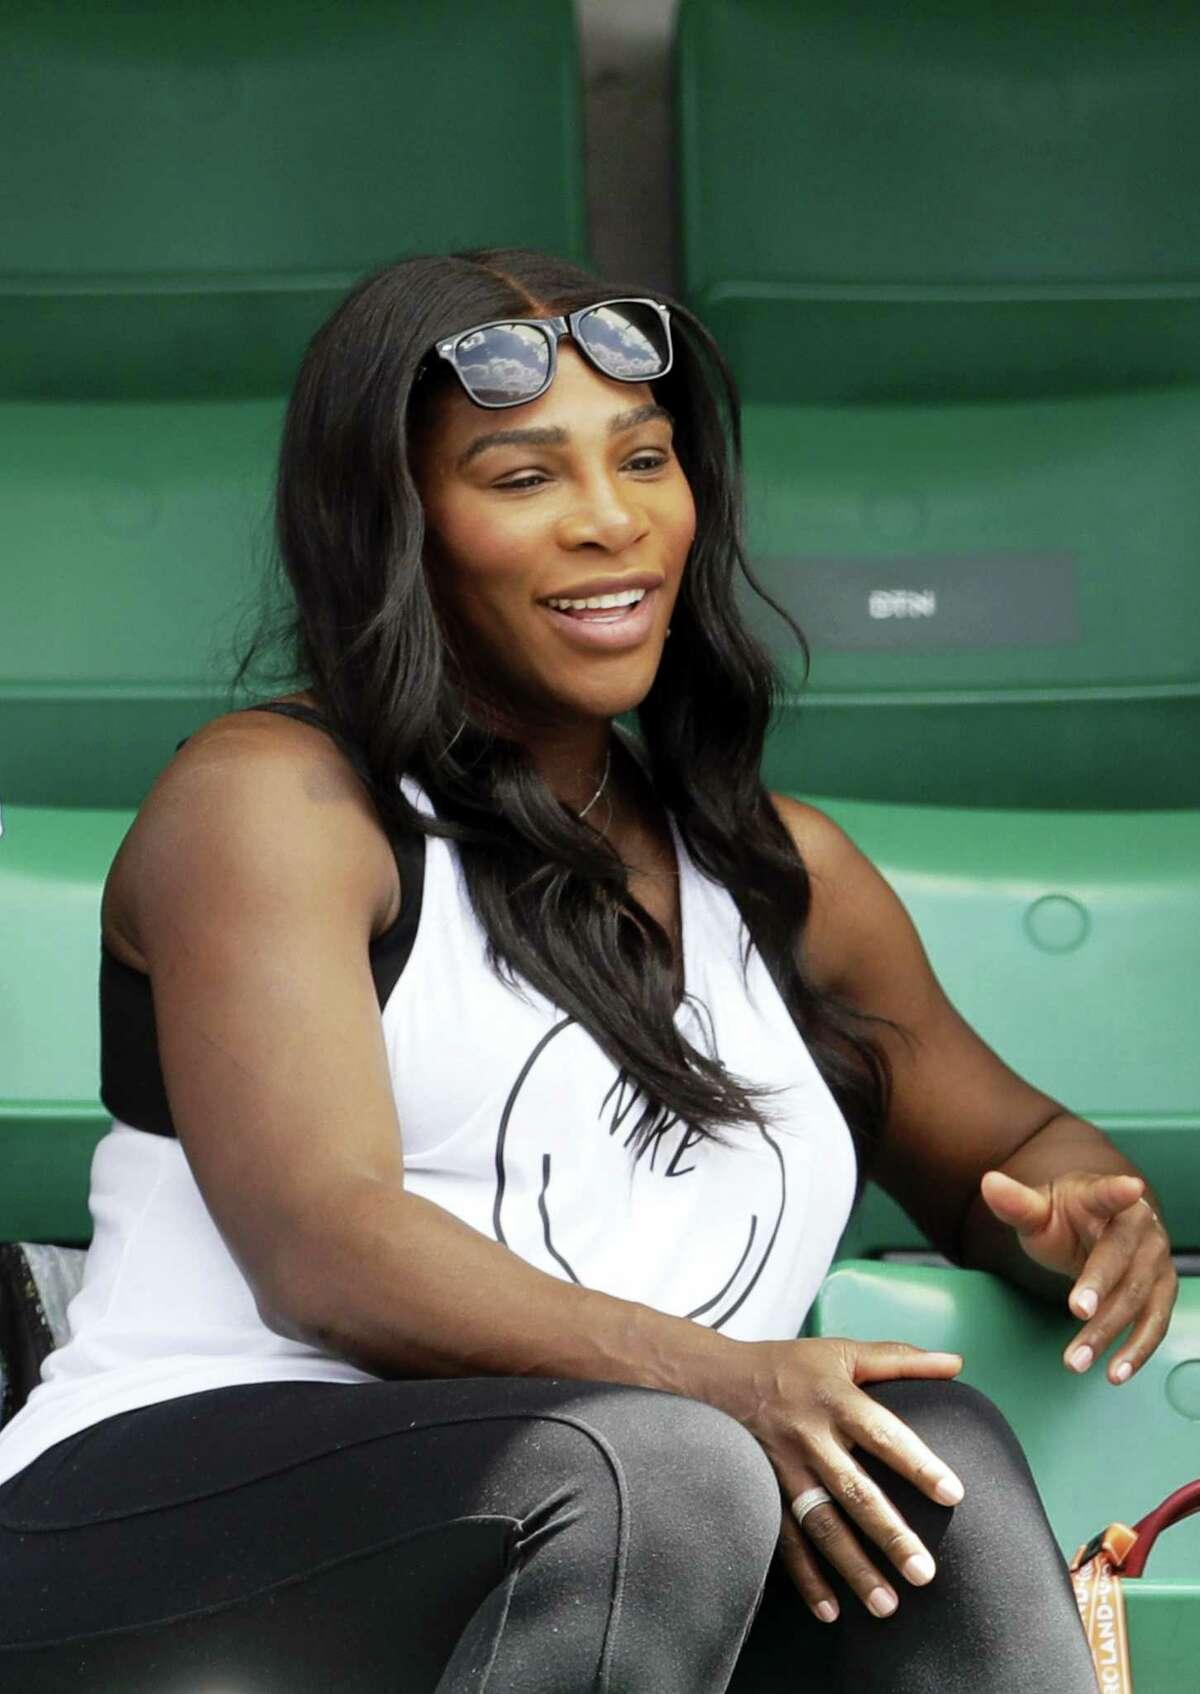 Serena Williams watches her sister Venus Williams play Kurumi Nara at the French Open earlier this week.